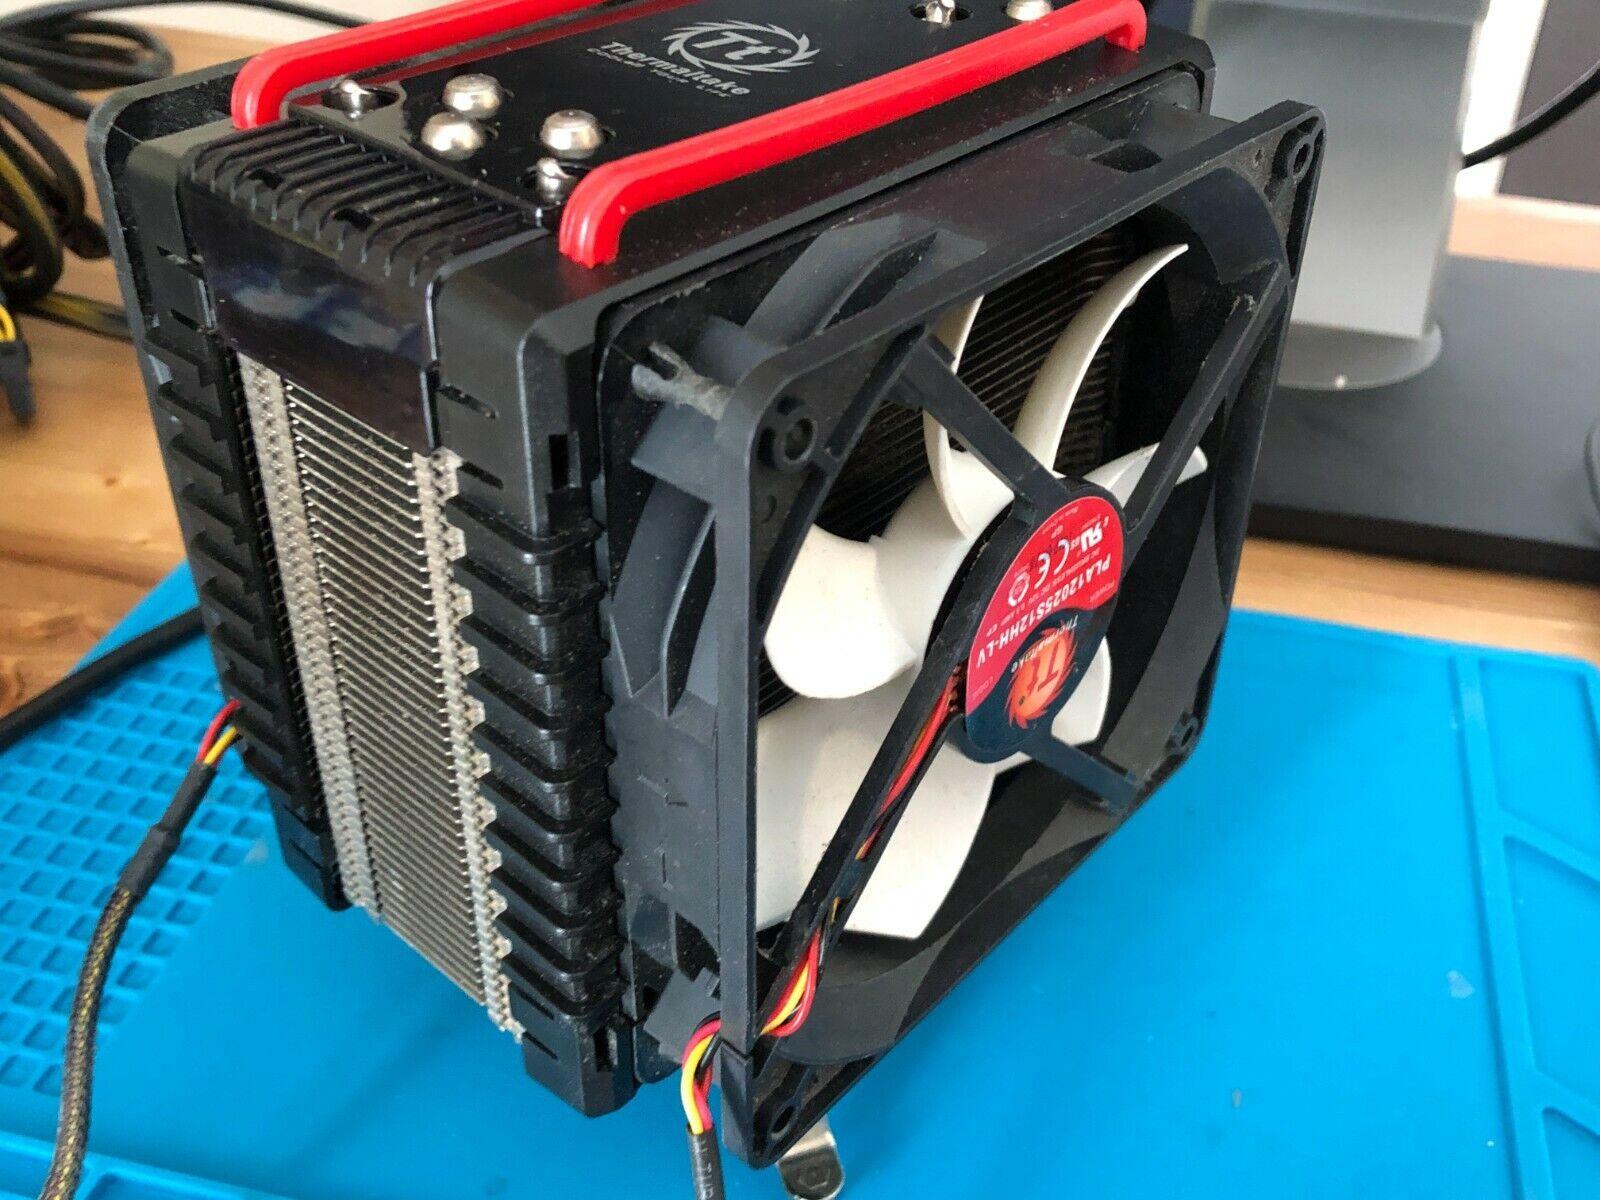 Thermaltake Frio CPU Cooler Intel AMD CLP0564 w/ Dual Fans